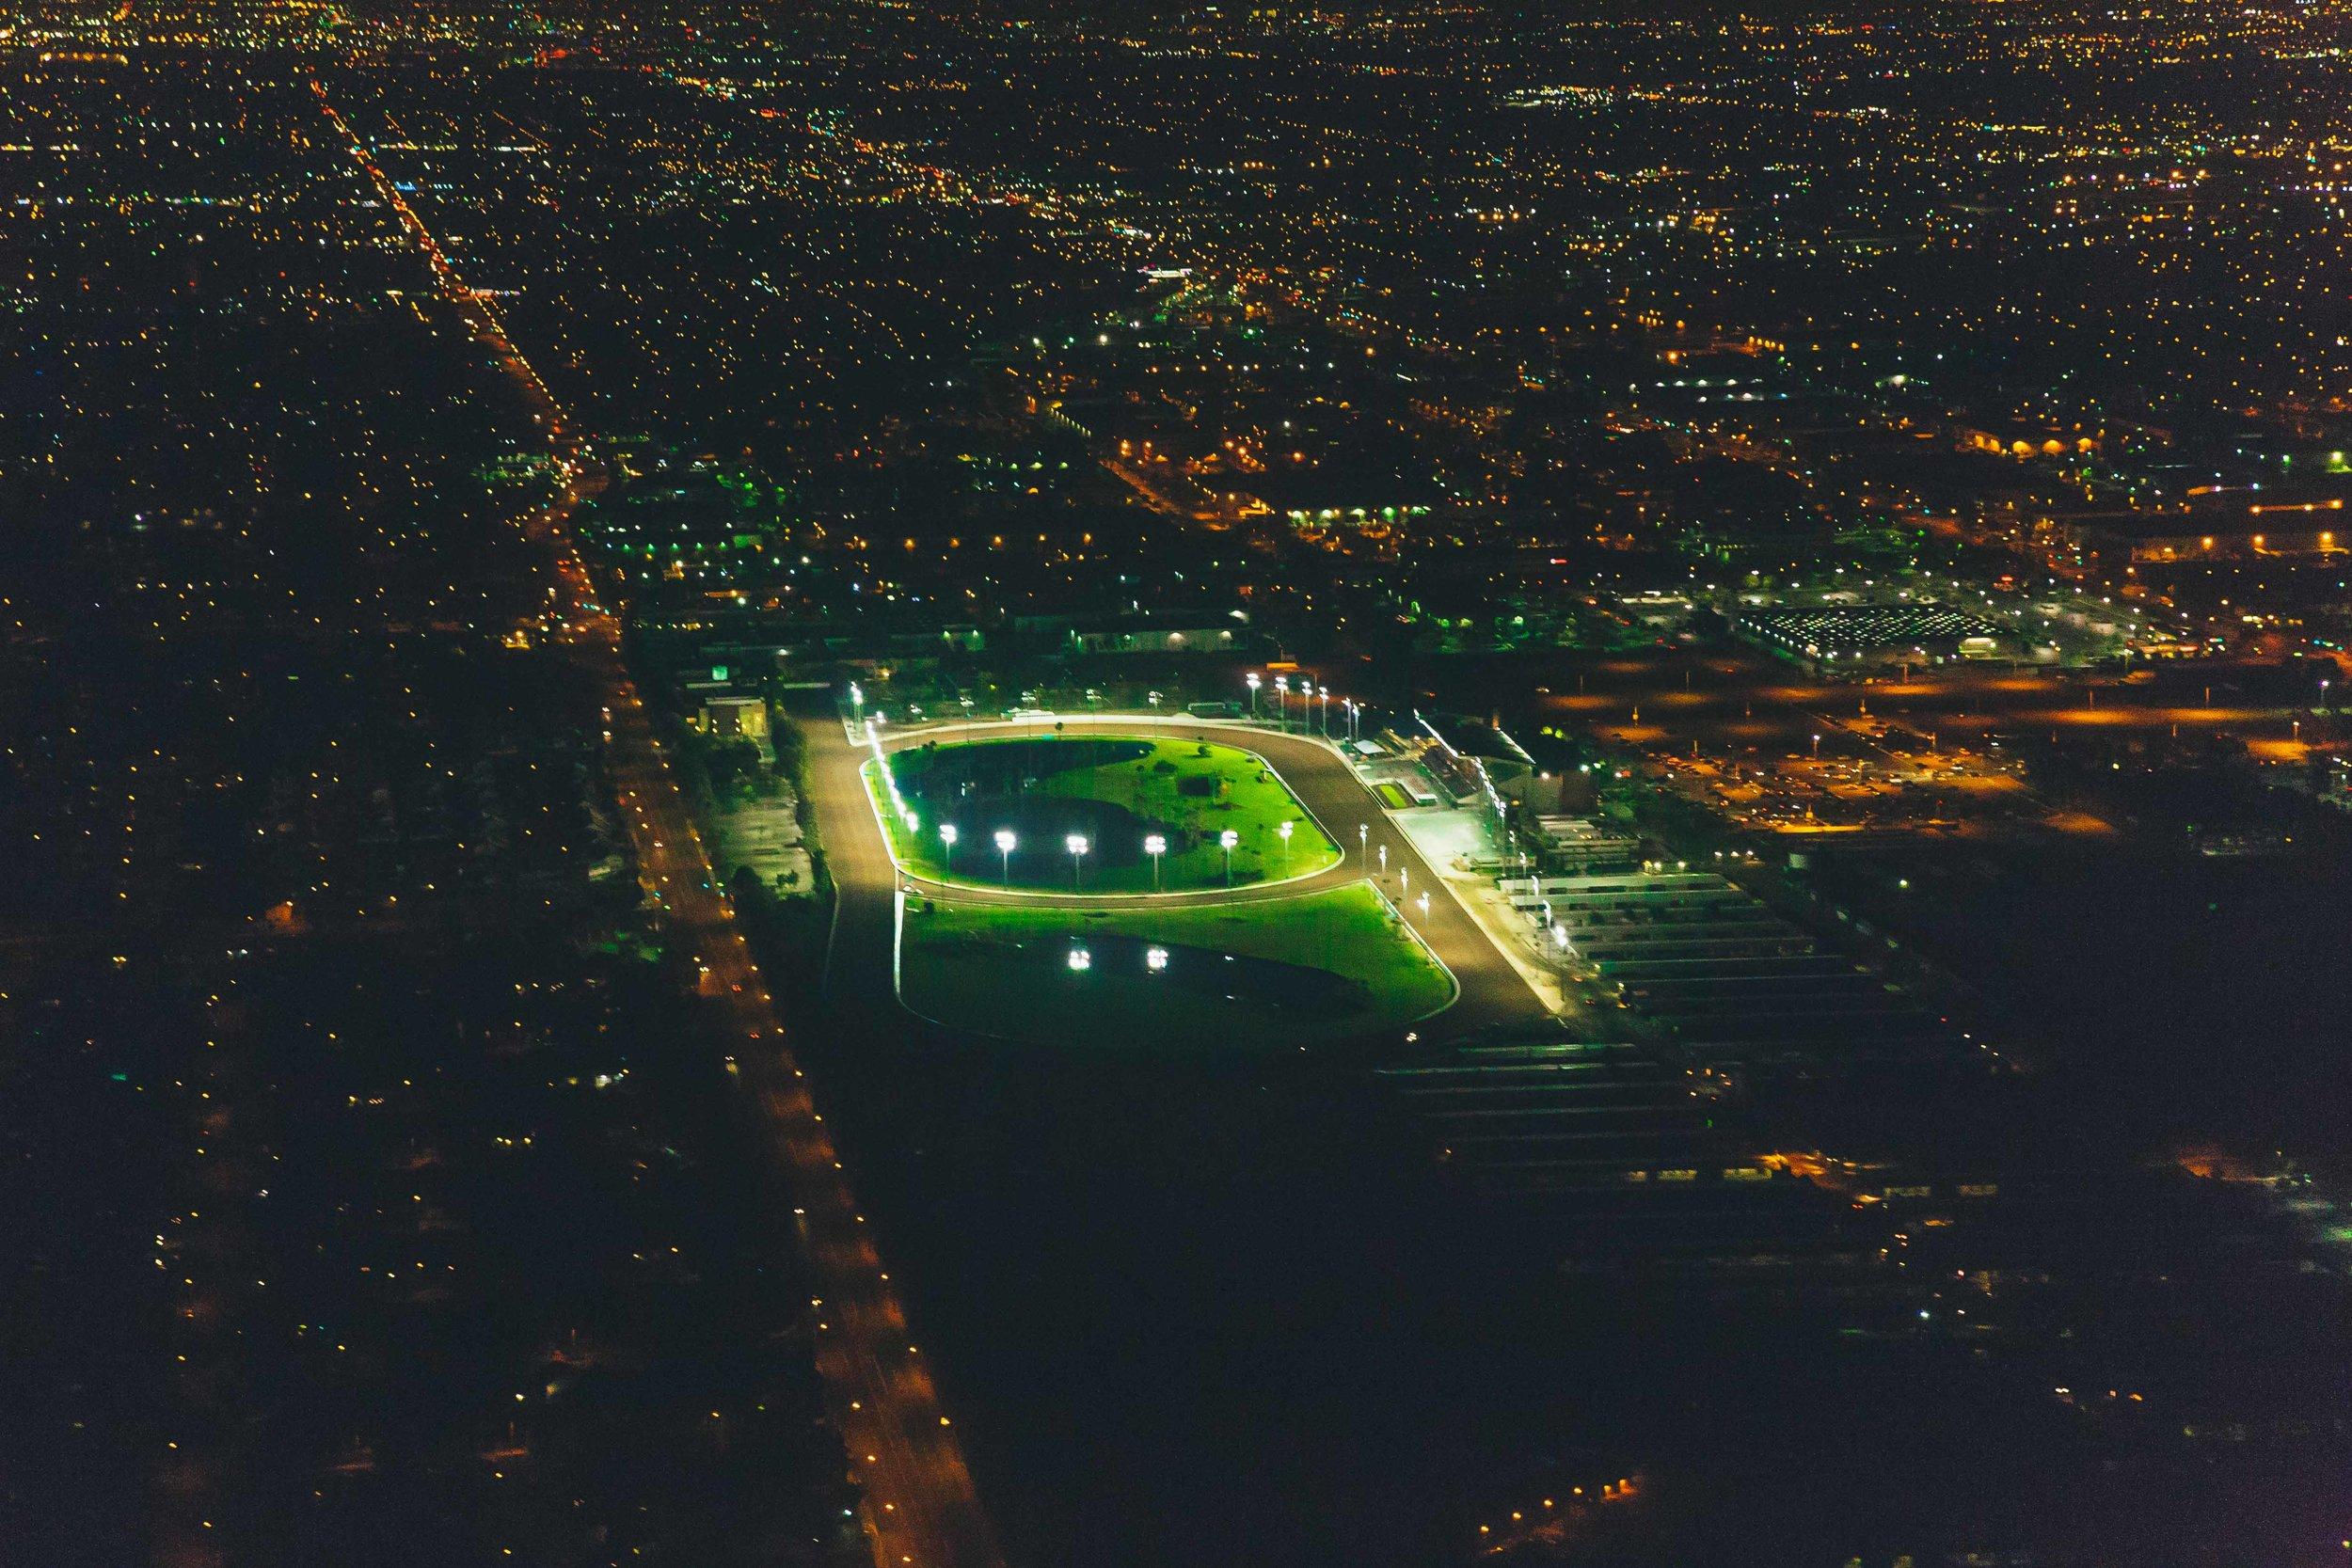 2015-LA-Aerial-009-sm.jpg